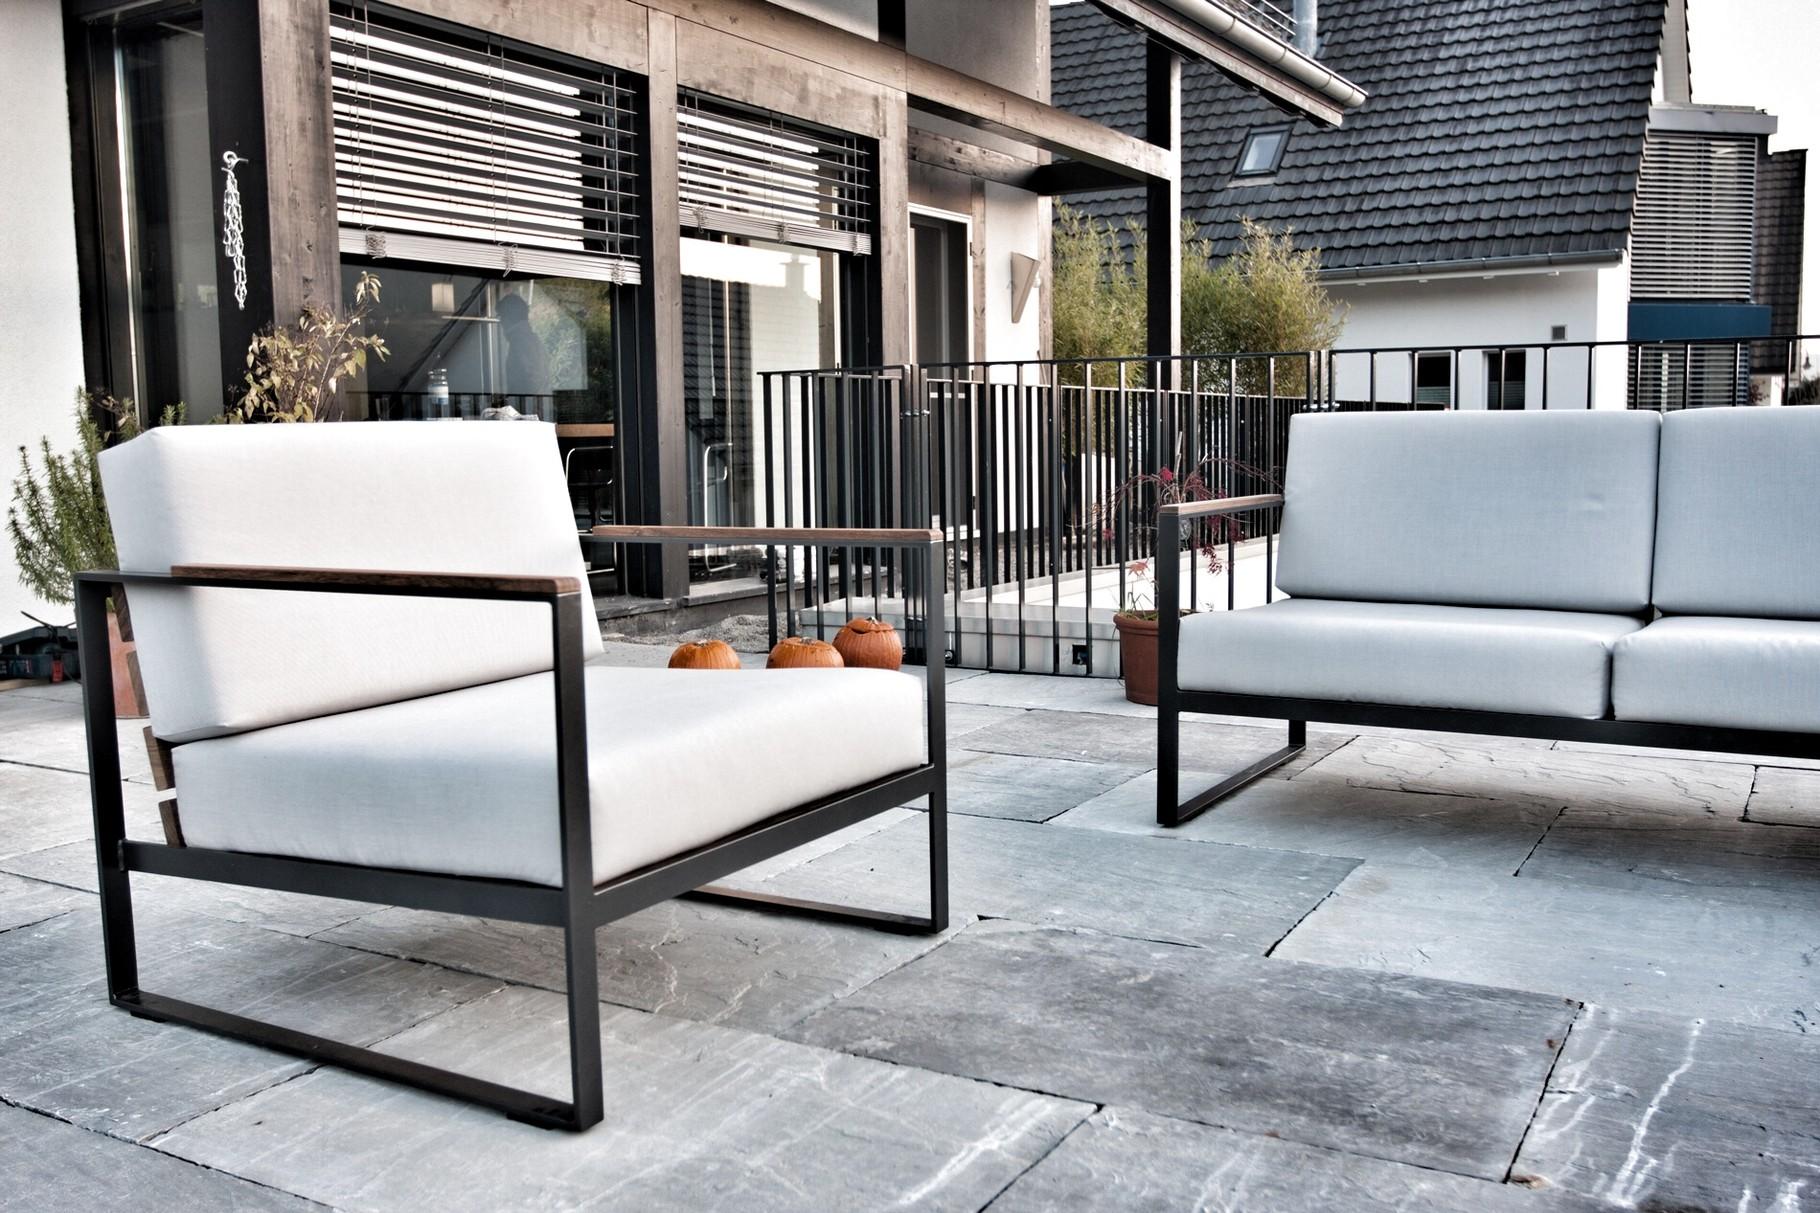 Start  Gartenlounge Schweiz fr Design Garten Metall Lounge Mbel